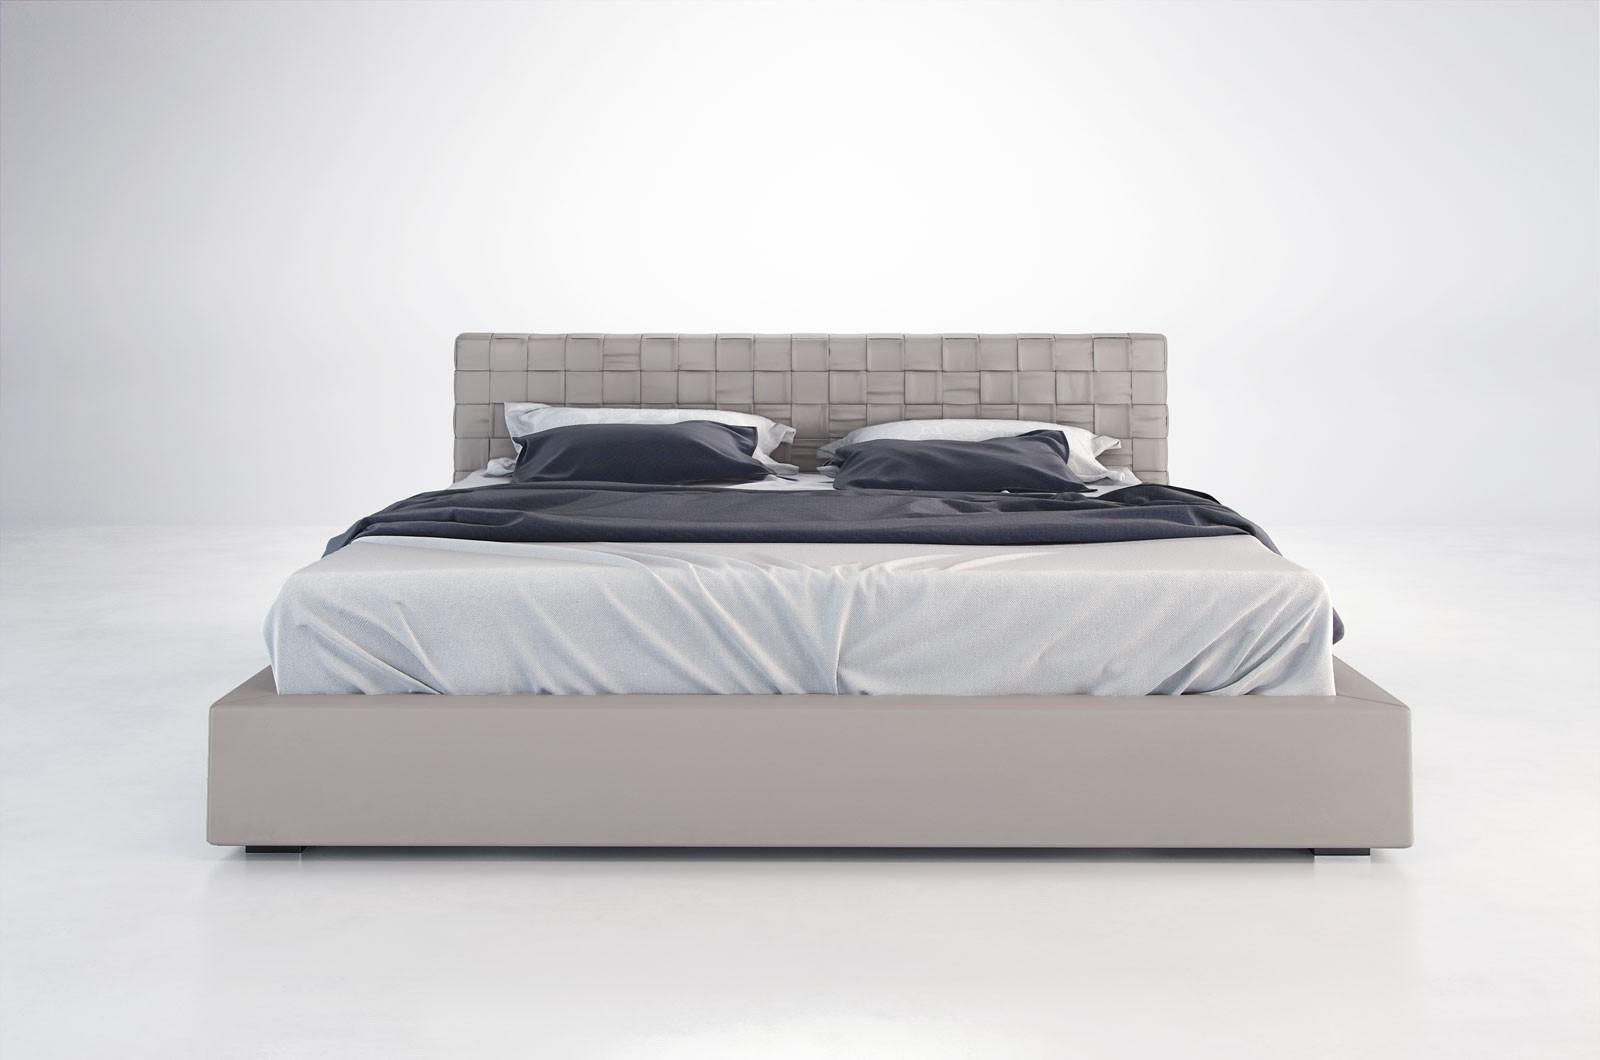 Madison modern leather bed by MODLOFT